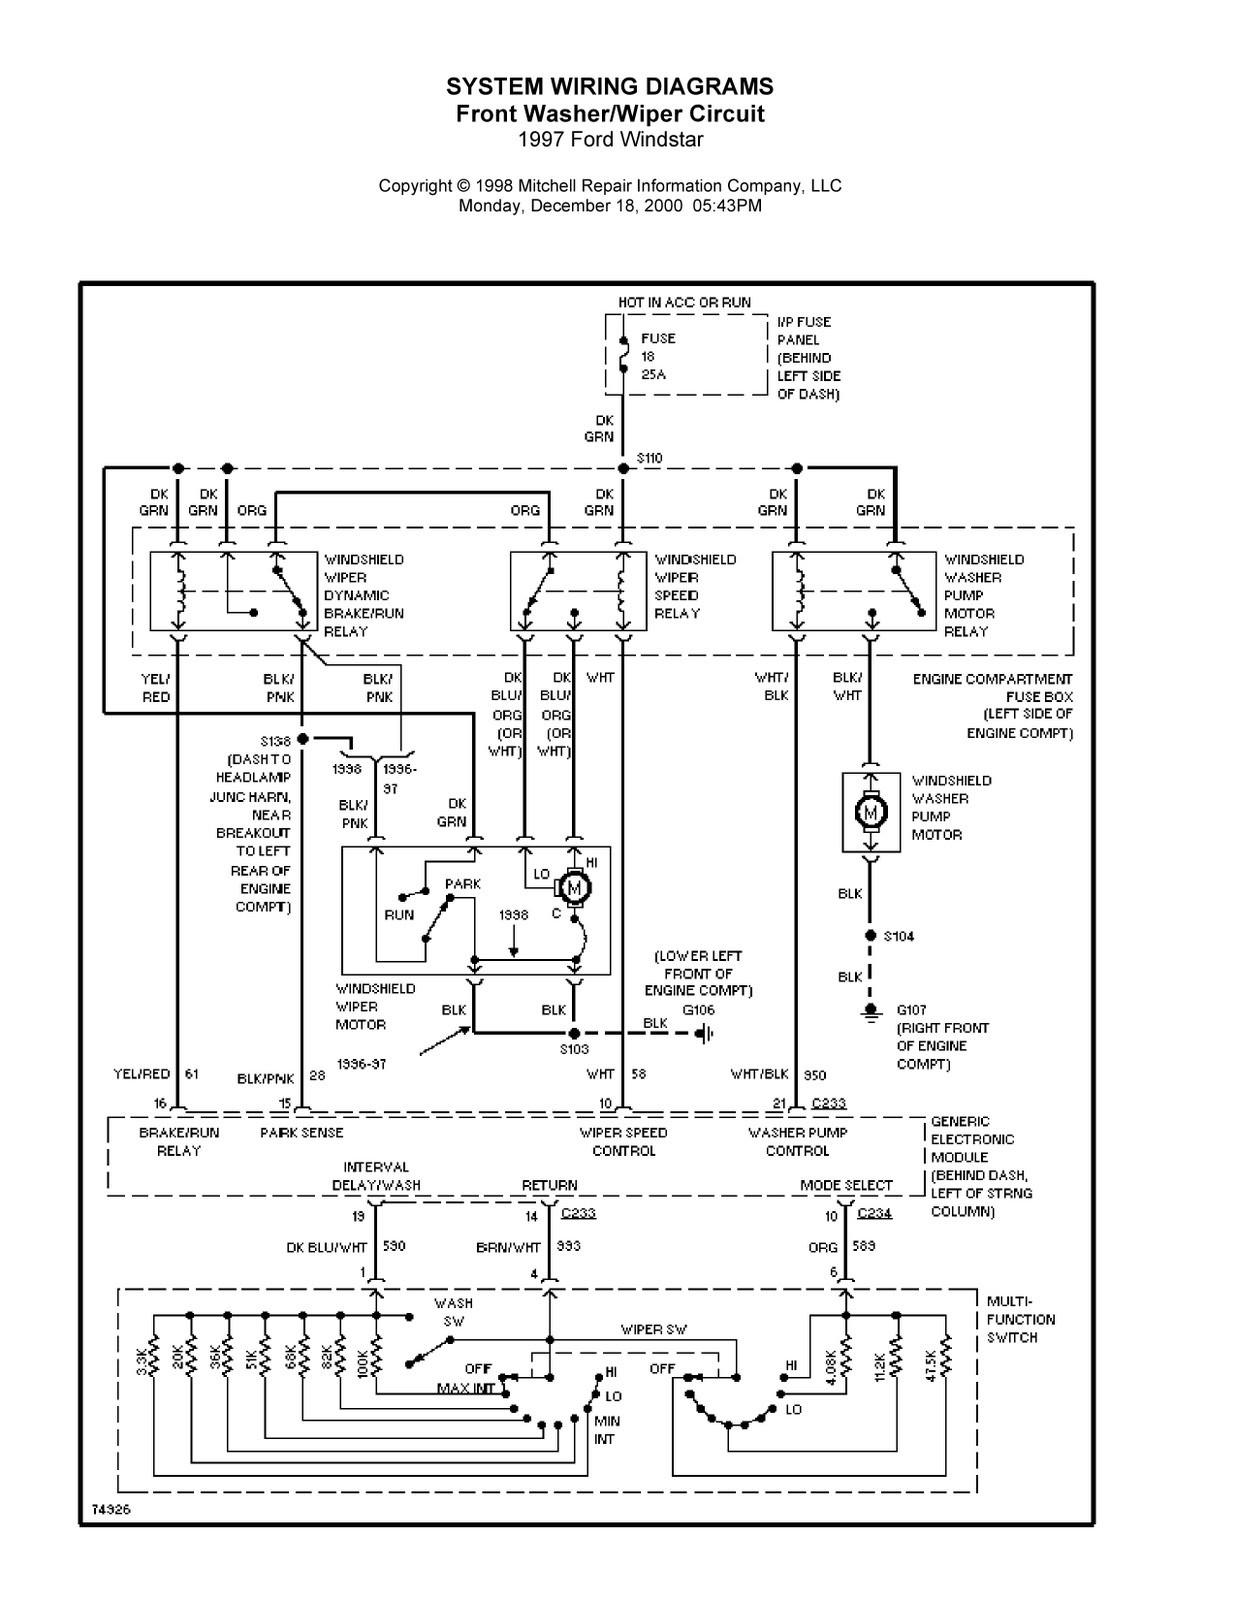 2002 ford windstar engine diagram 96 windstar engine starts but rpms 96 ford windstar relay diagram 2002 ford windstar engine diagram 1997 ford windstar plete system wiring diagrams stunning 2003 of 2002